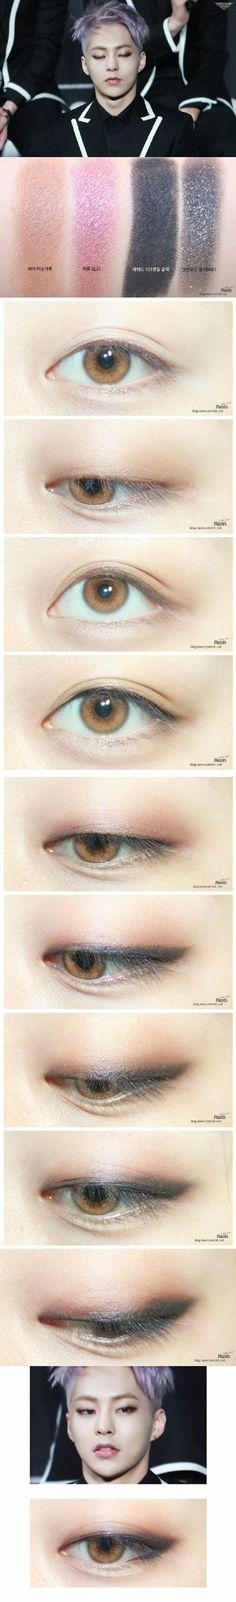 EXO Xiumin eye make up tutorial (cr.sh_rvd)